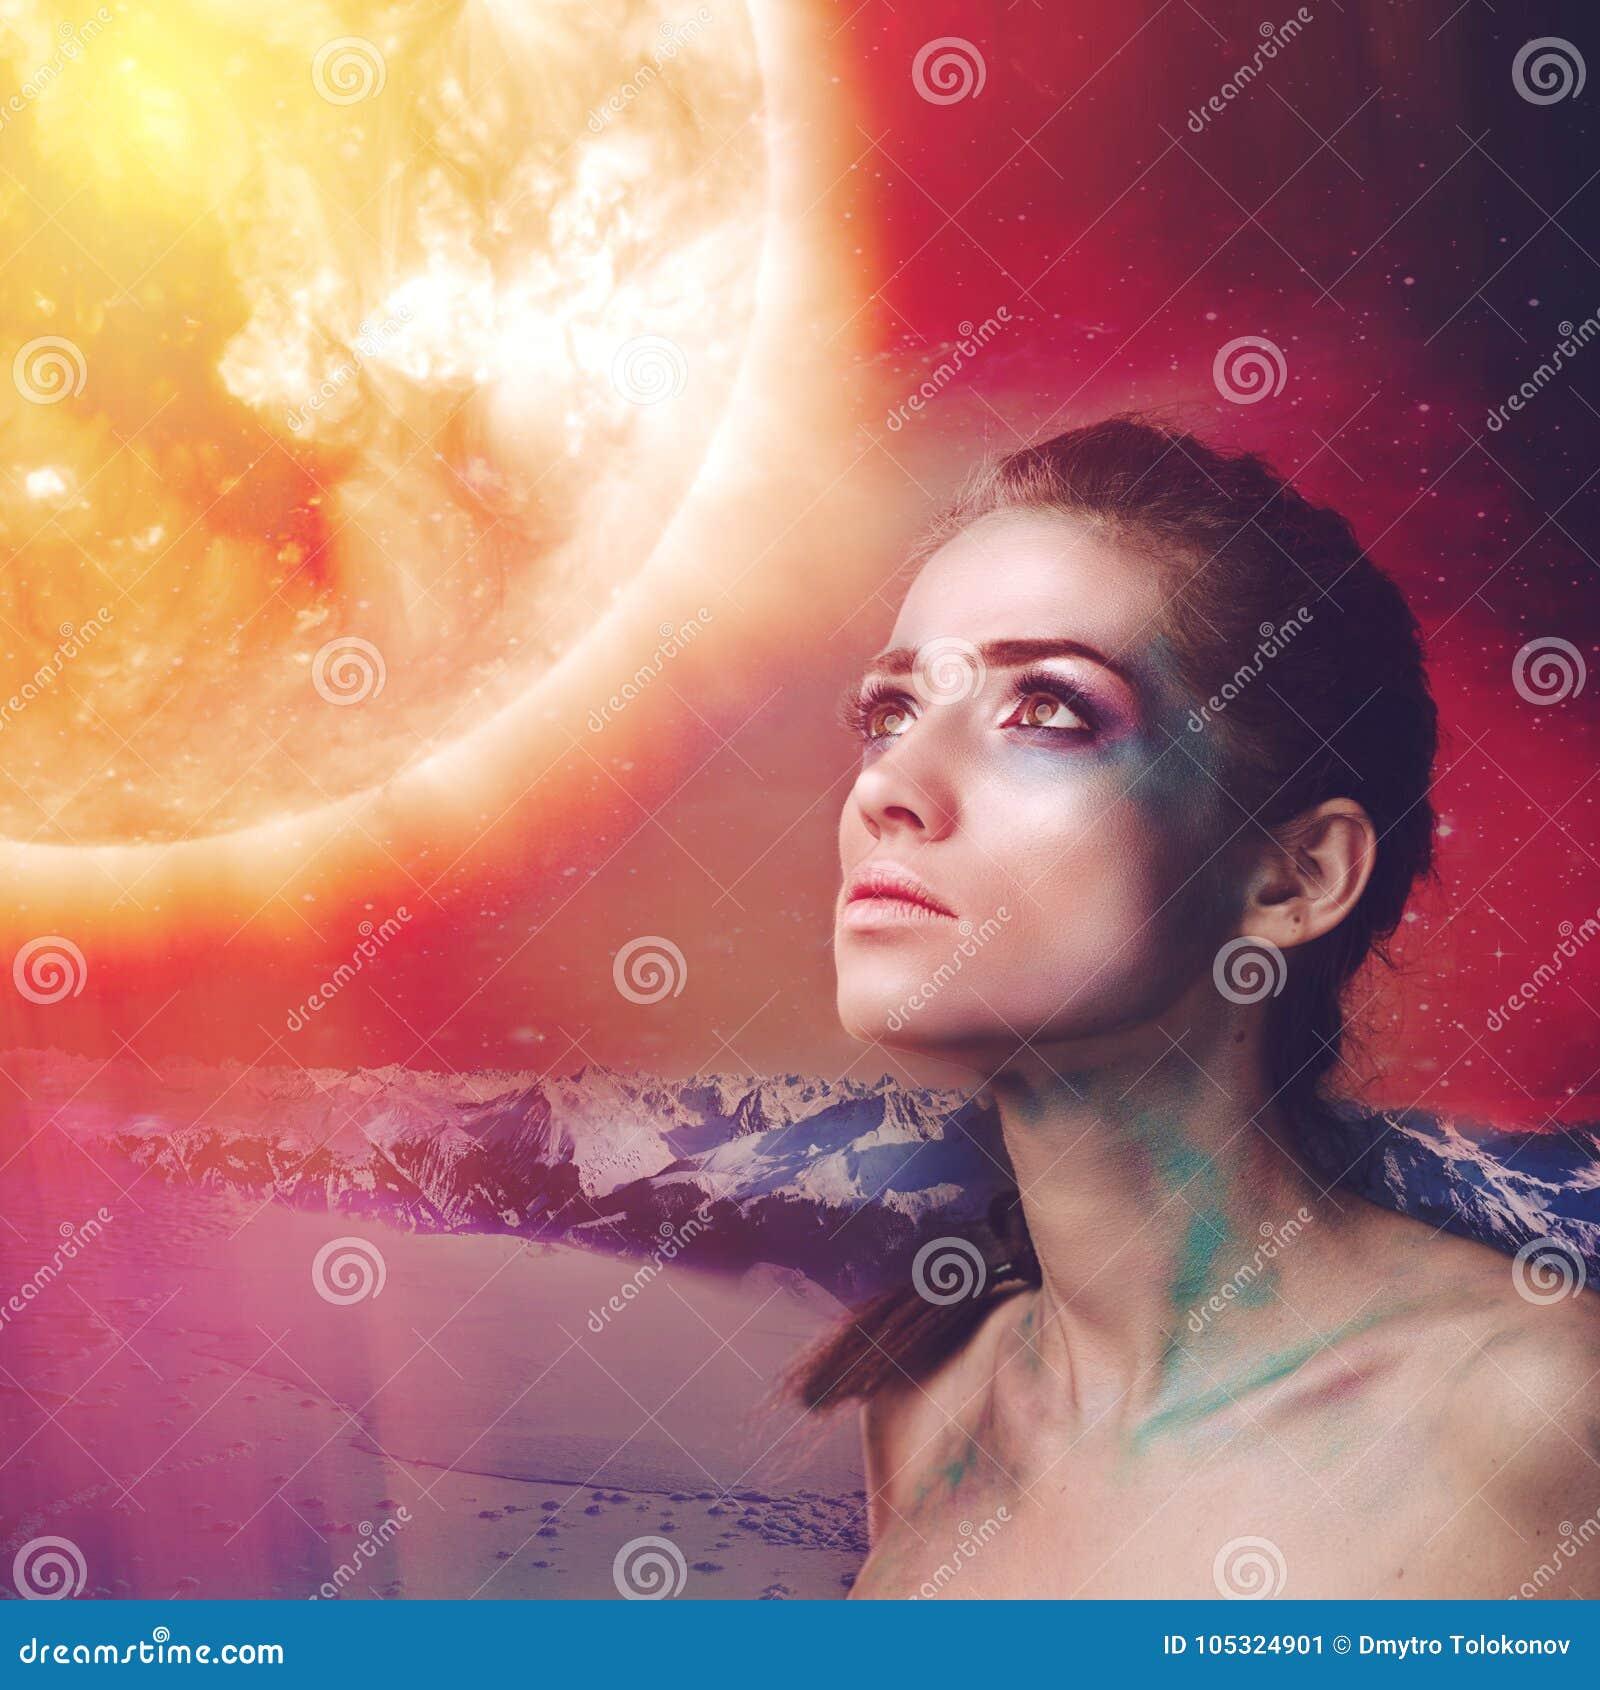 Supernova, science fiction female portrait